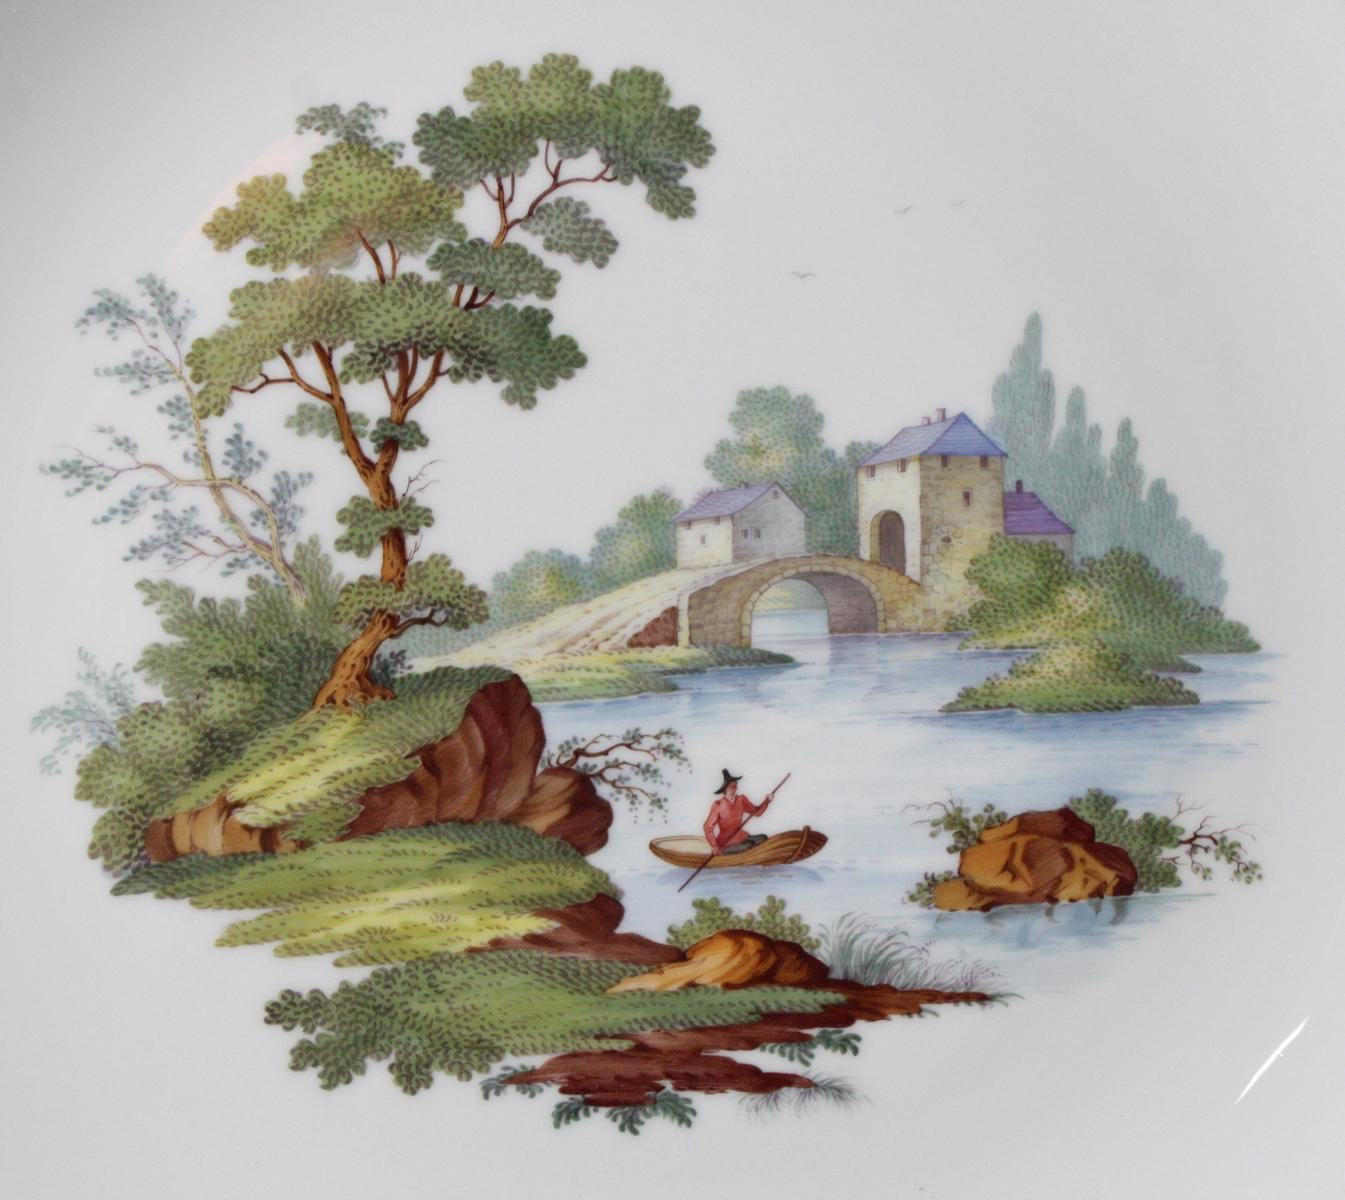 Wandteller 'Bunte Landschaft', Höchst, signiert Kurt Schröder-2